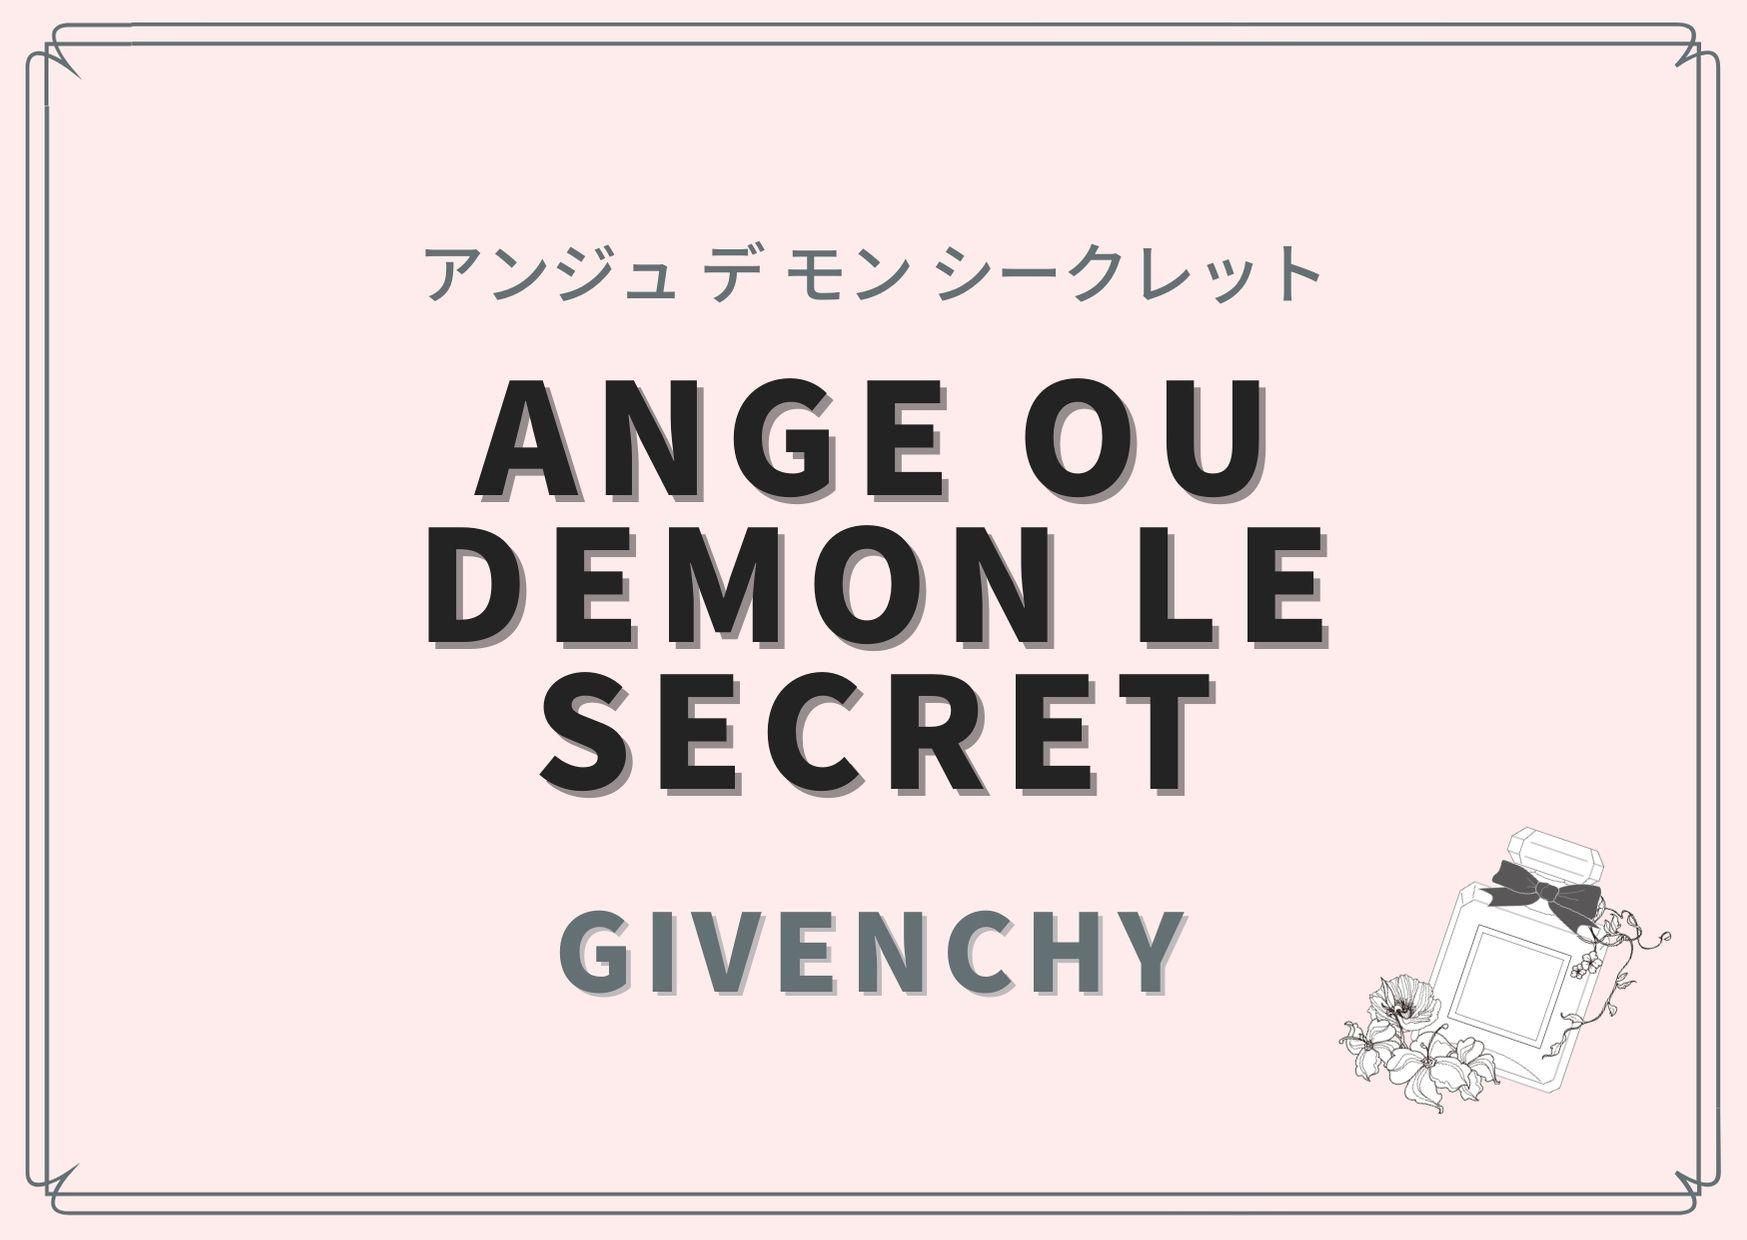 ange ou demon Le secret(アンジュ デ モン シークレット)/GIVENCHY(ジバンシィ)